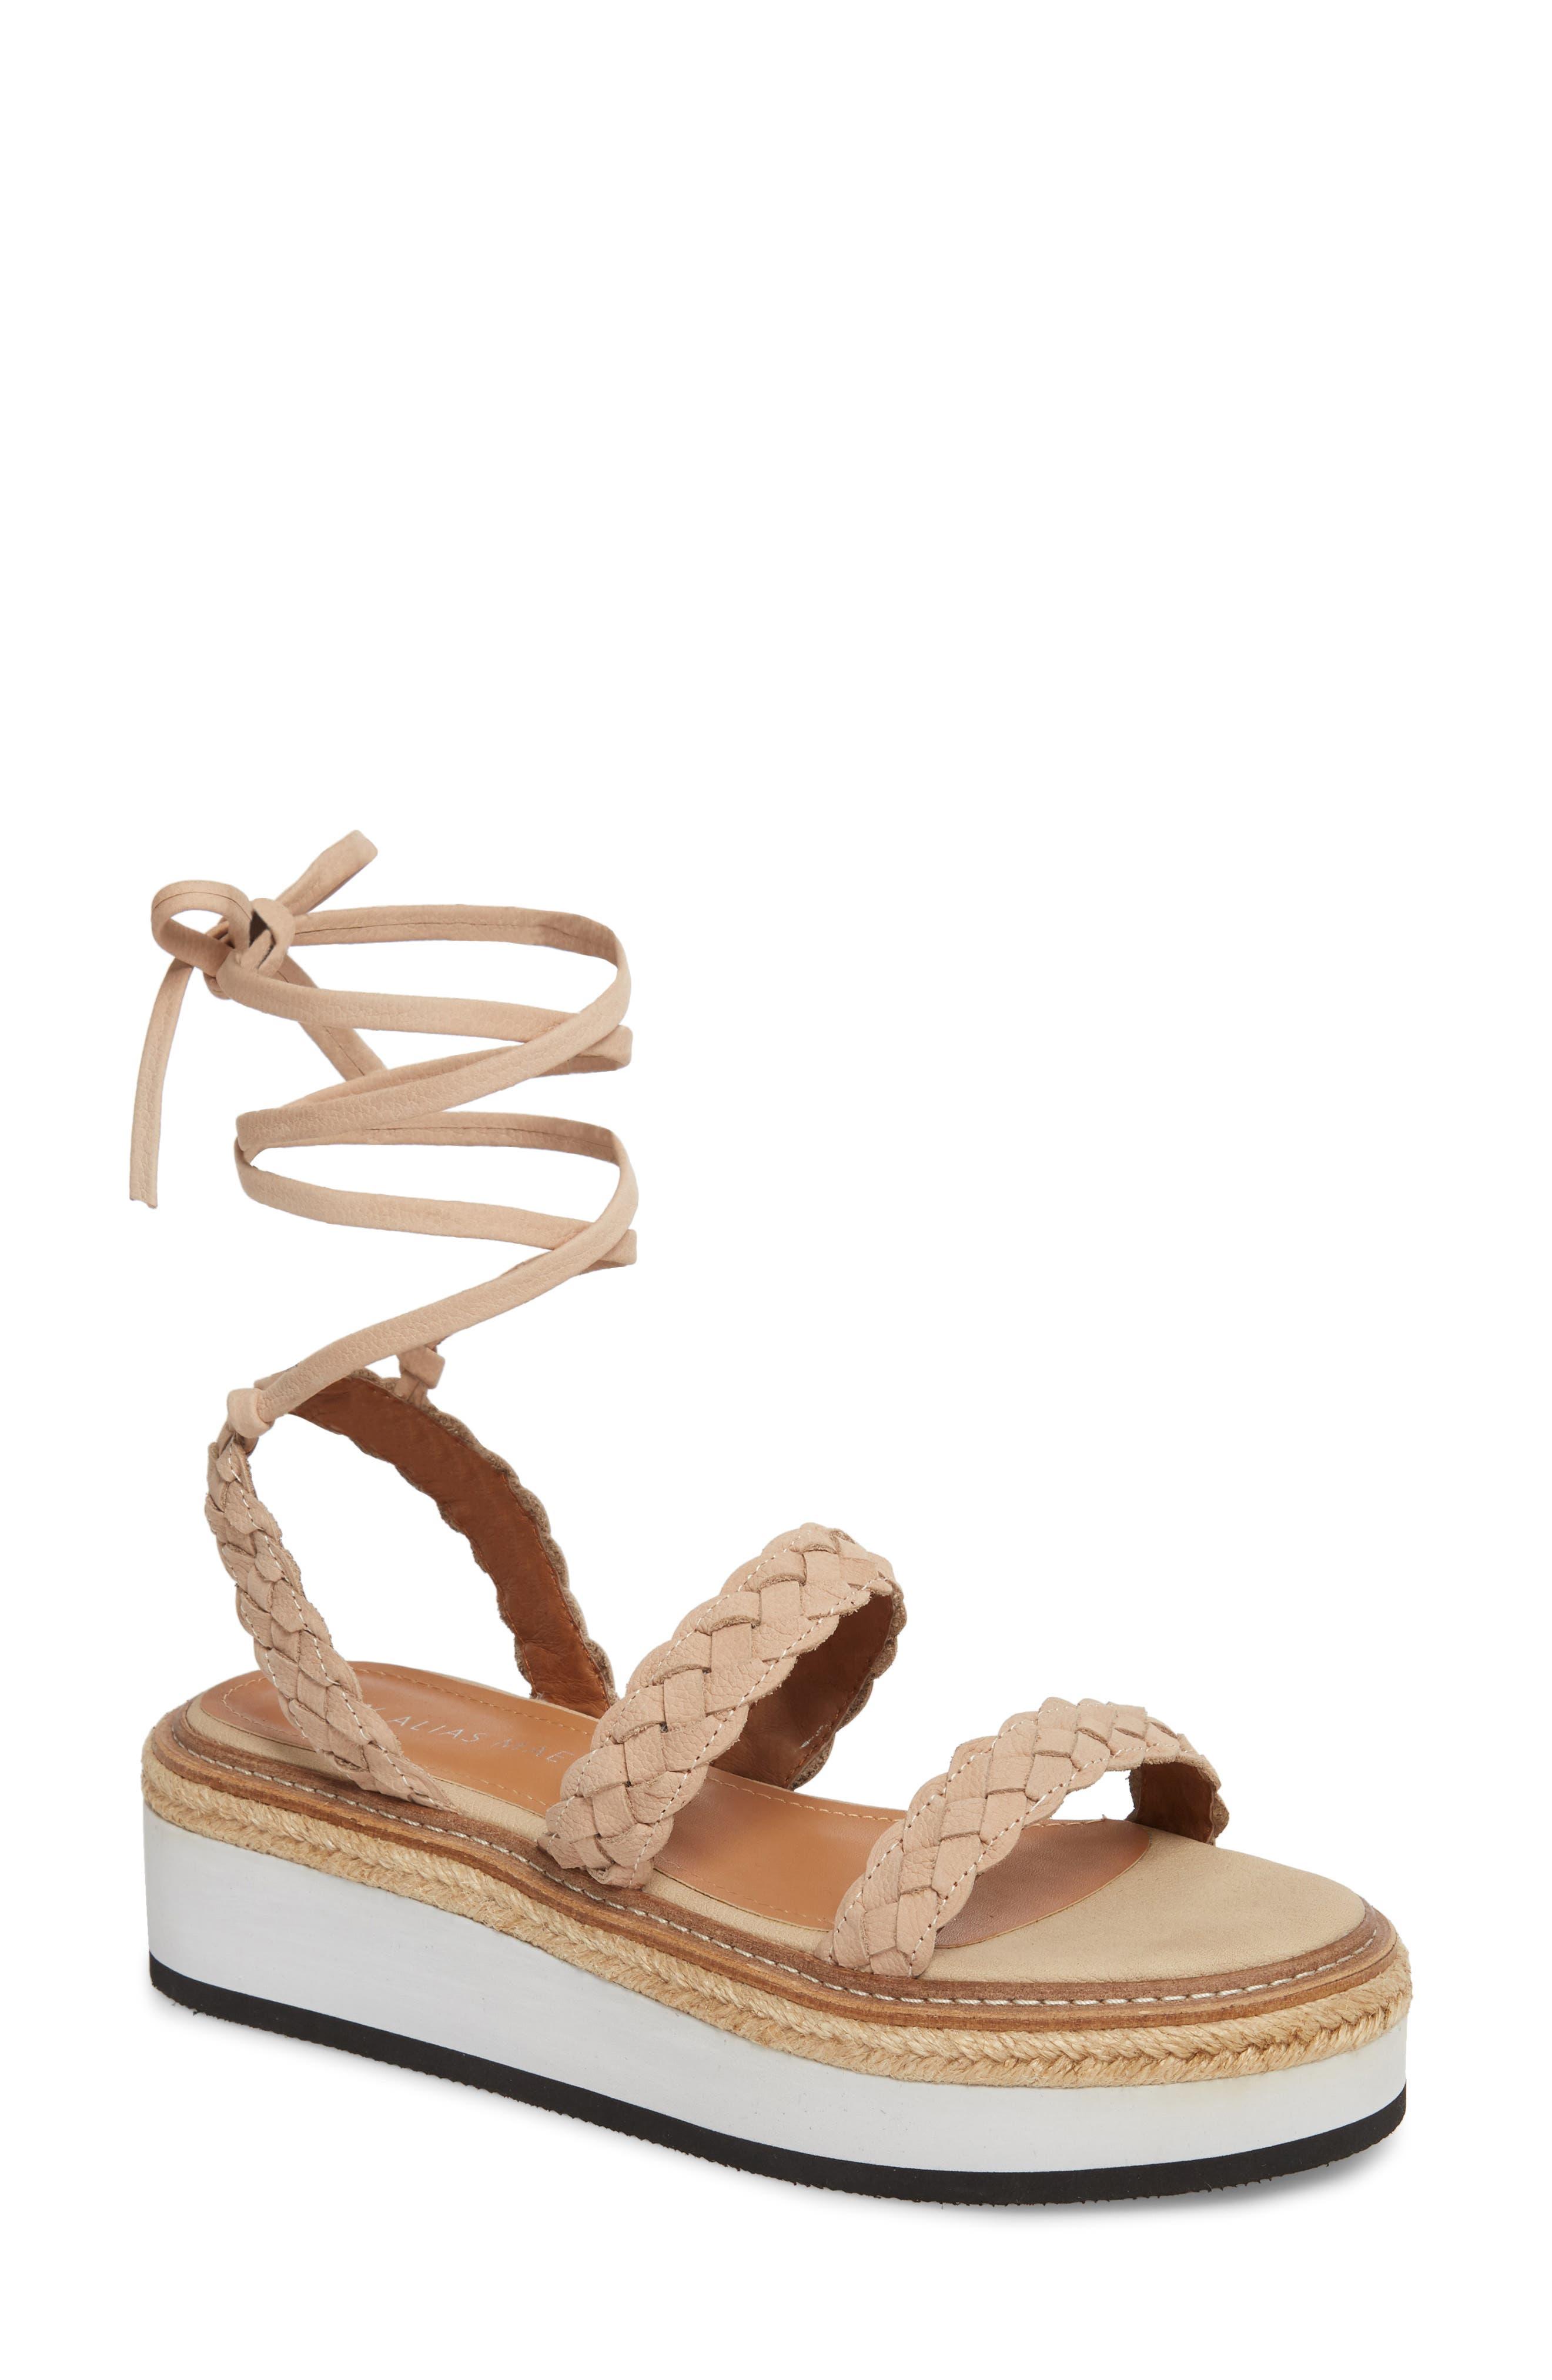 Nieve Braided Platform Sandal,                         Main,                         color, Natural Leather